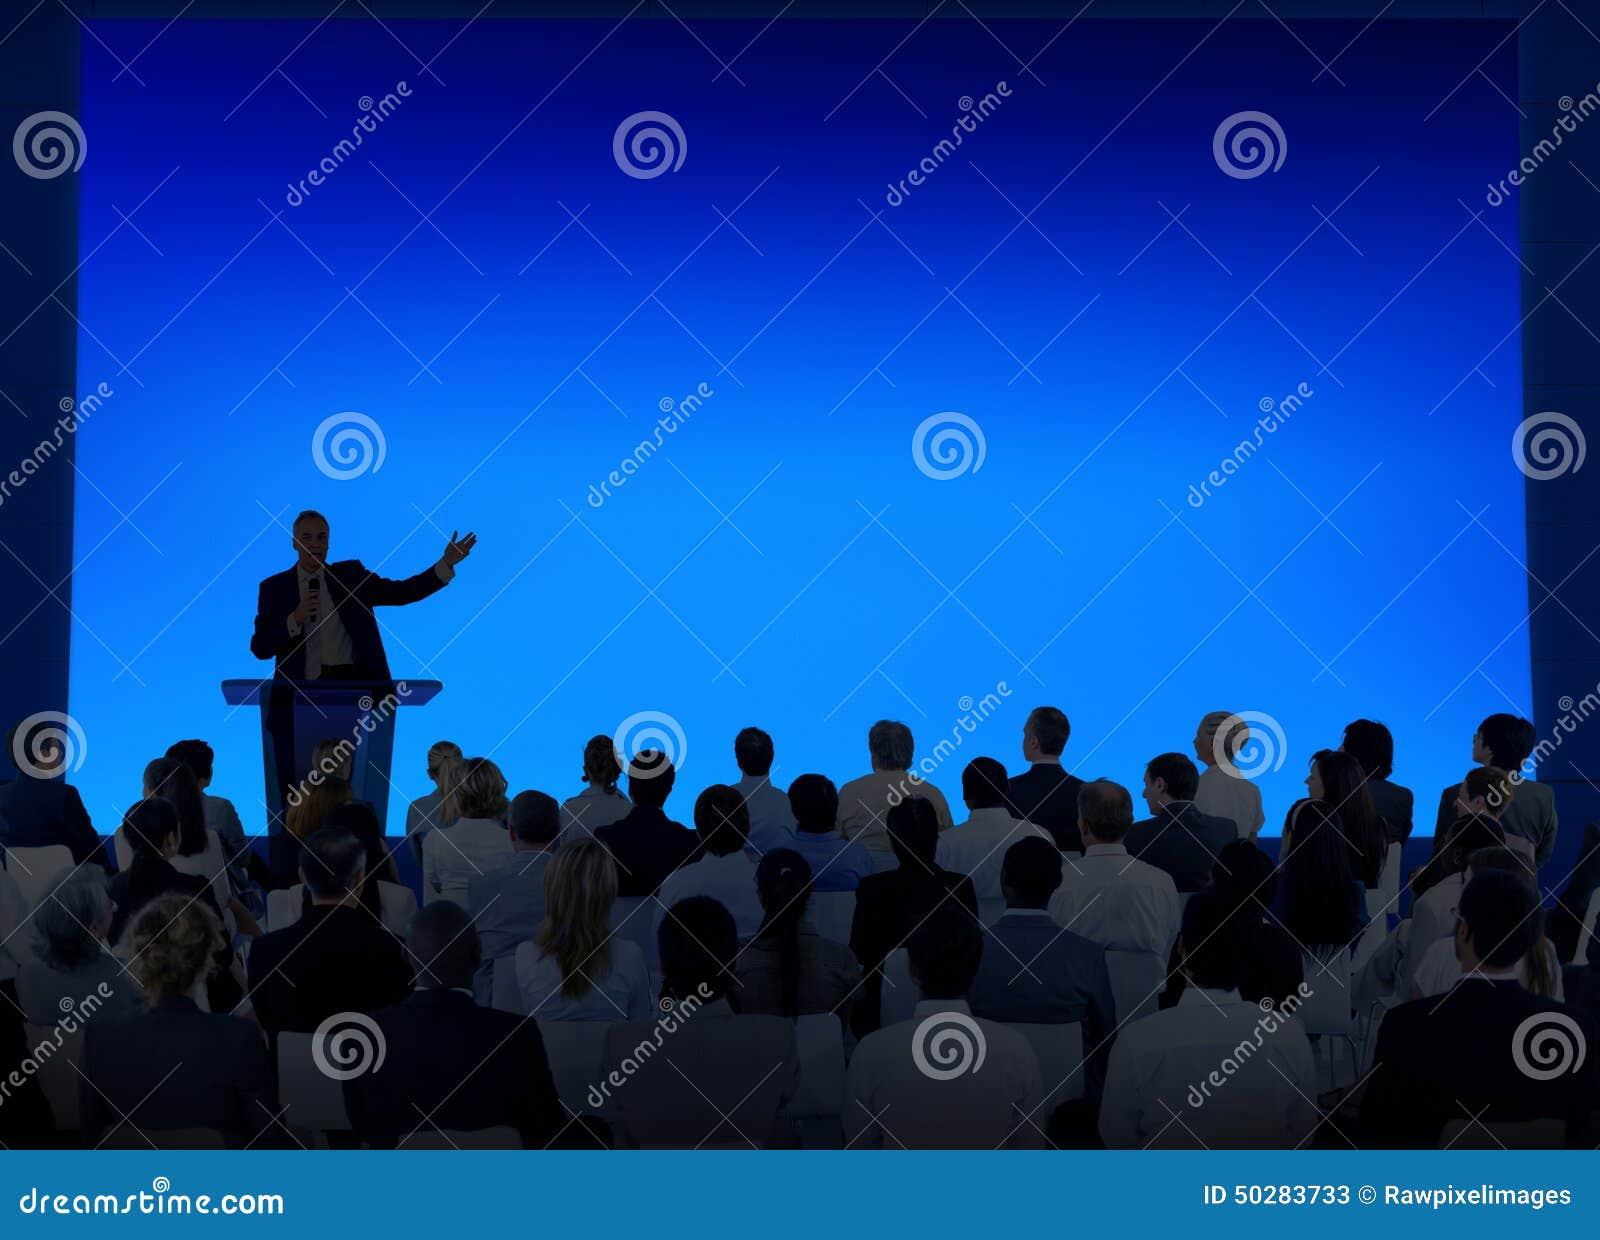 Концепция команды семинара встречи бизнес-конференции